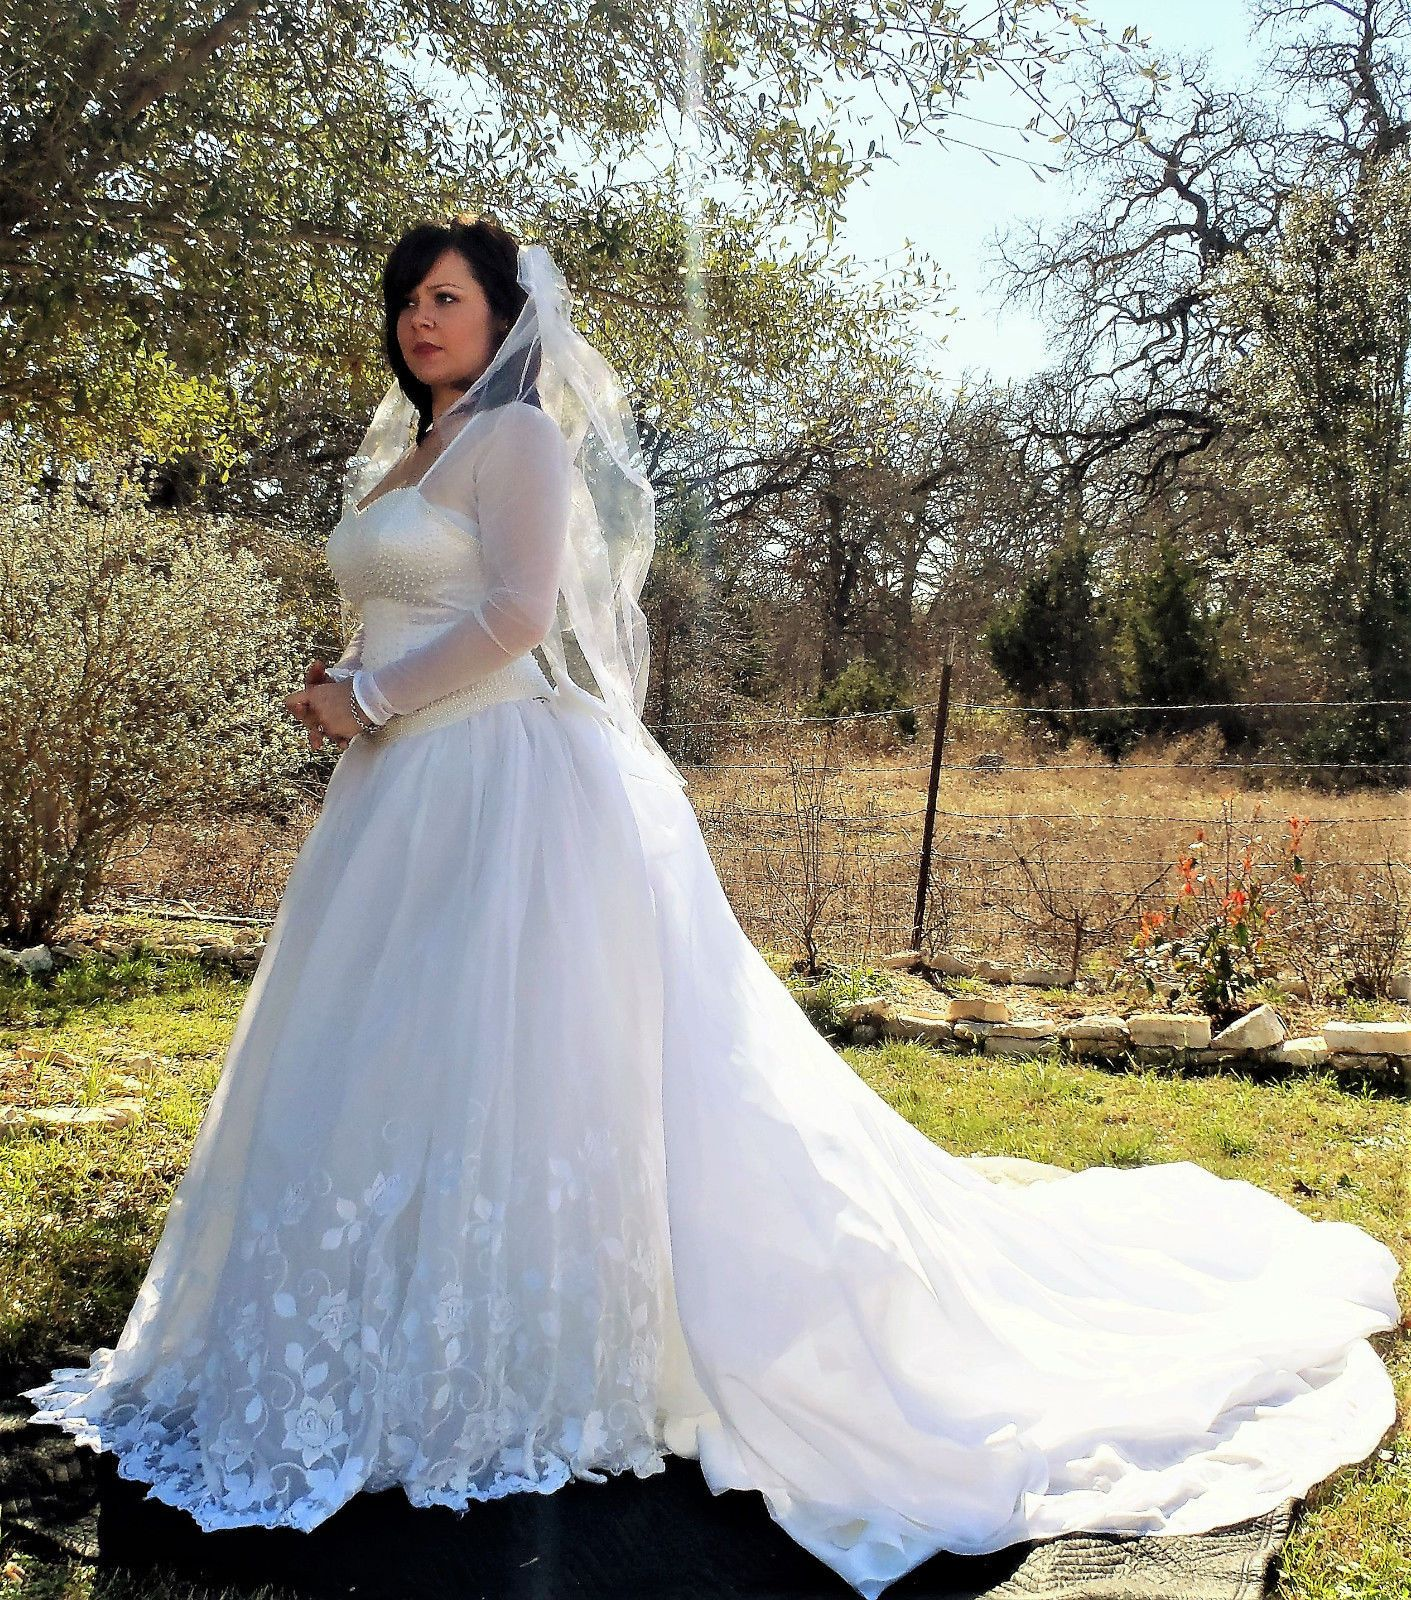 Moonlight White Ballgown Wedding Dress with Detachable